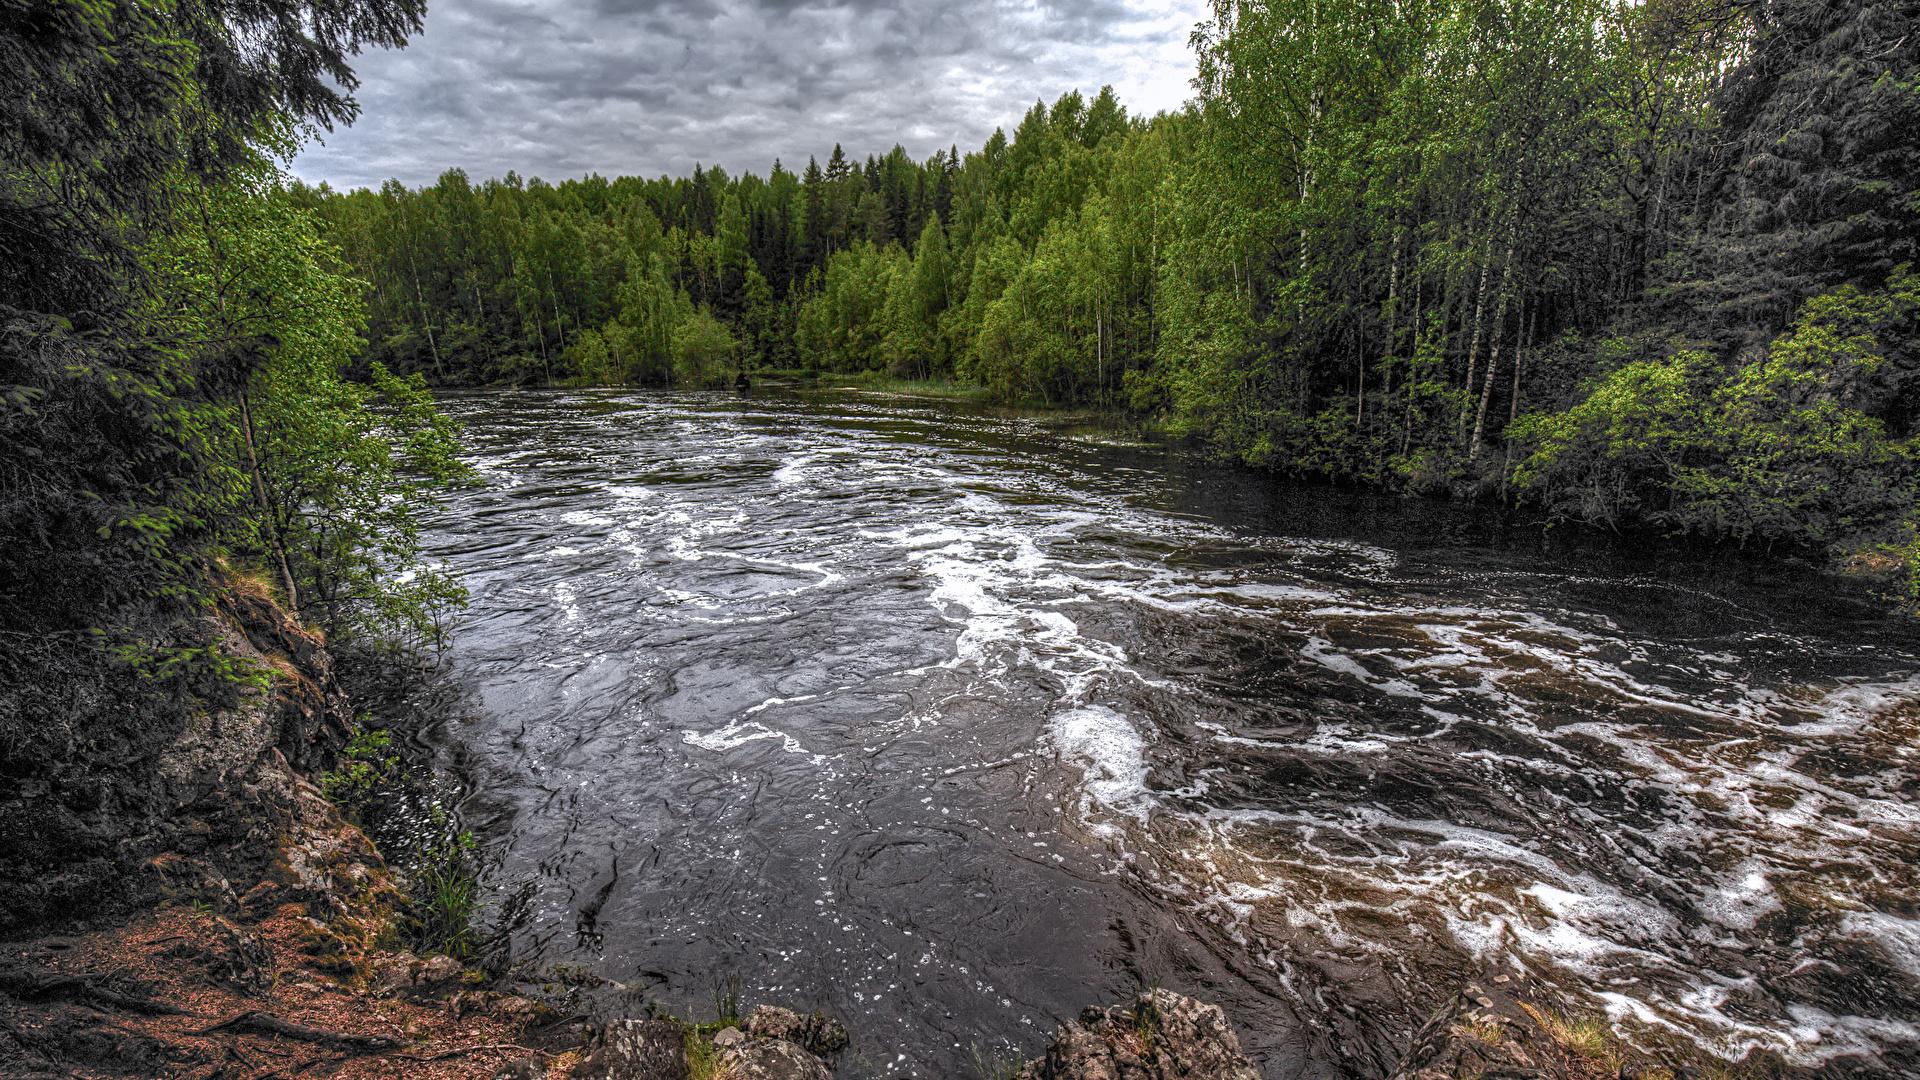 Картинки Россия Suna River Republic of Karelia Природа лес Реки 1920x1080 Леса река речка